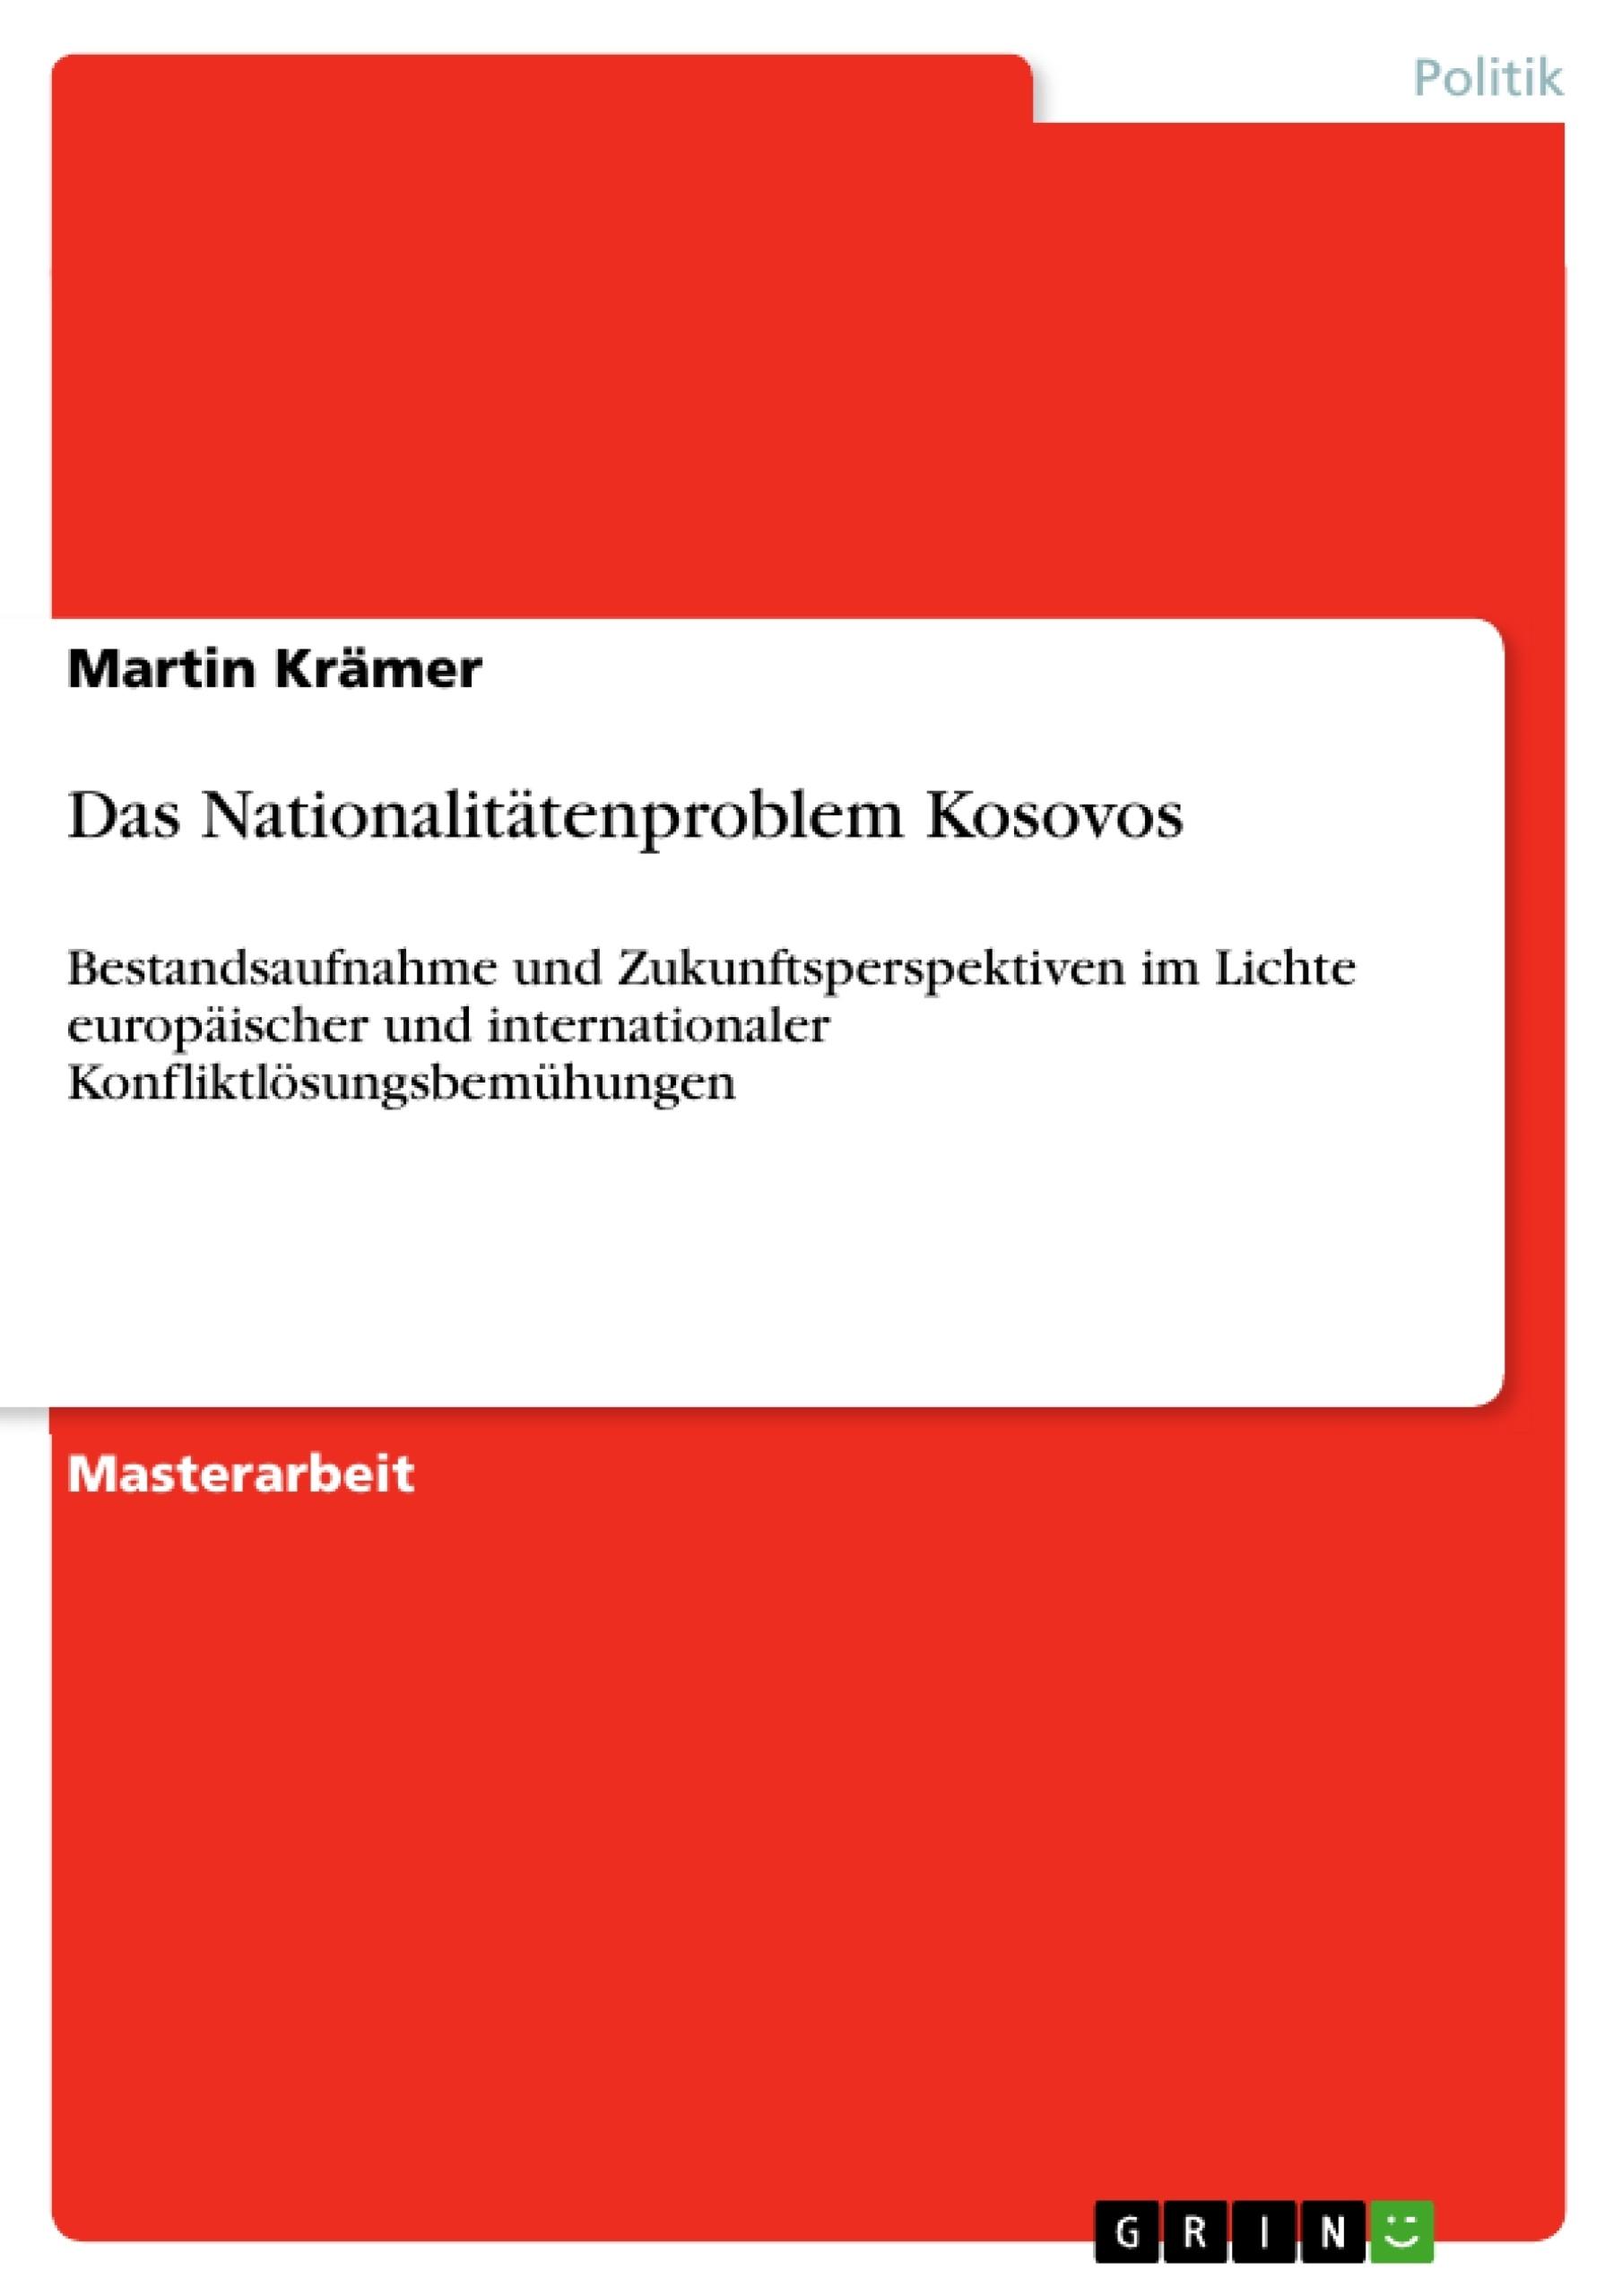 Titel: Das Nationalitätenproblem Kosovos